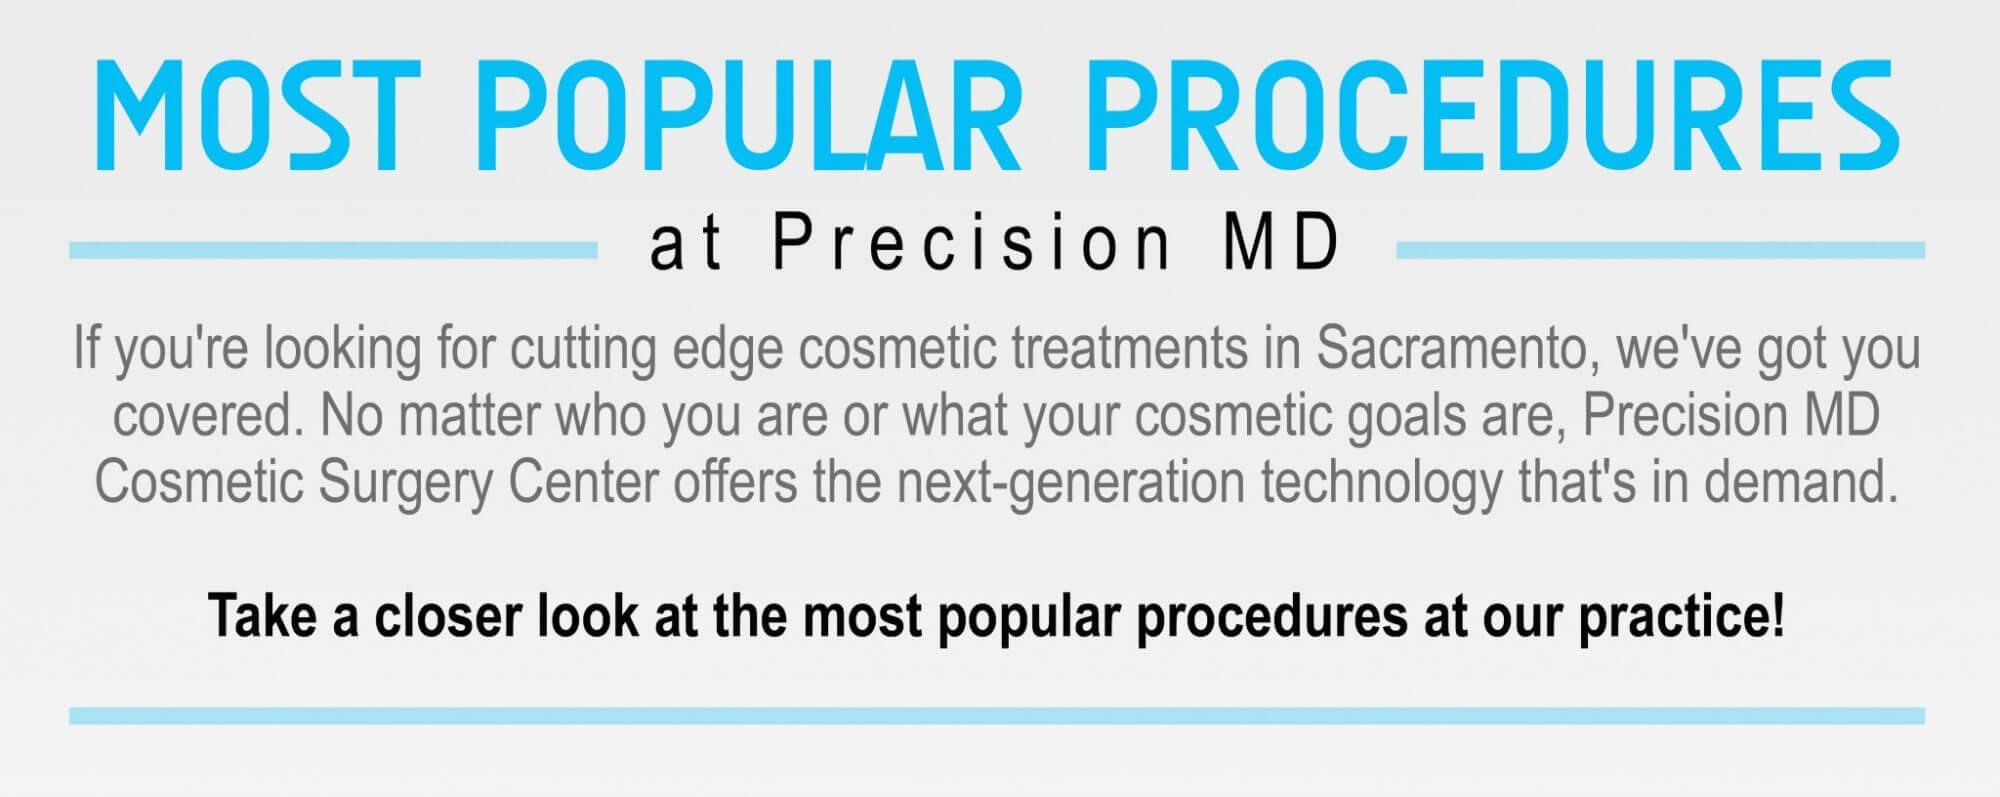 Popular Procedures at Precision MD